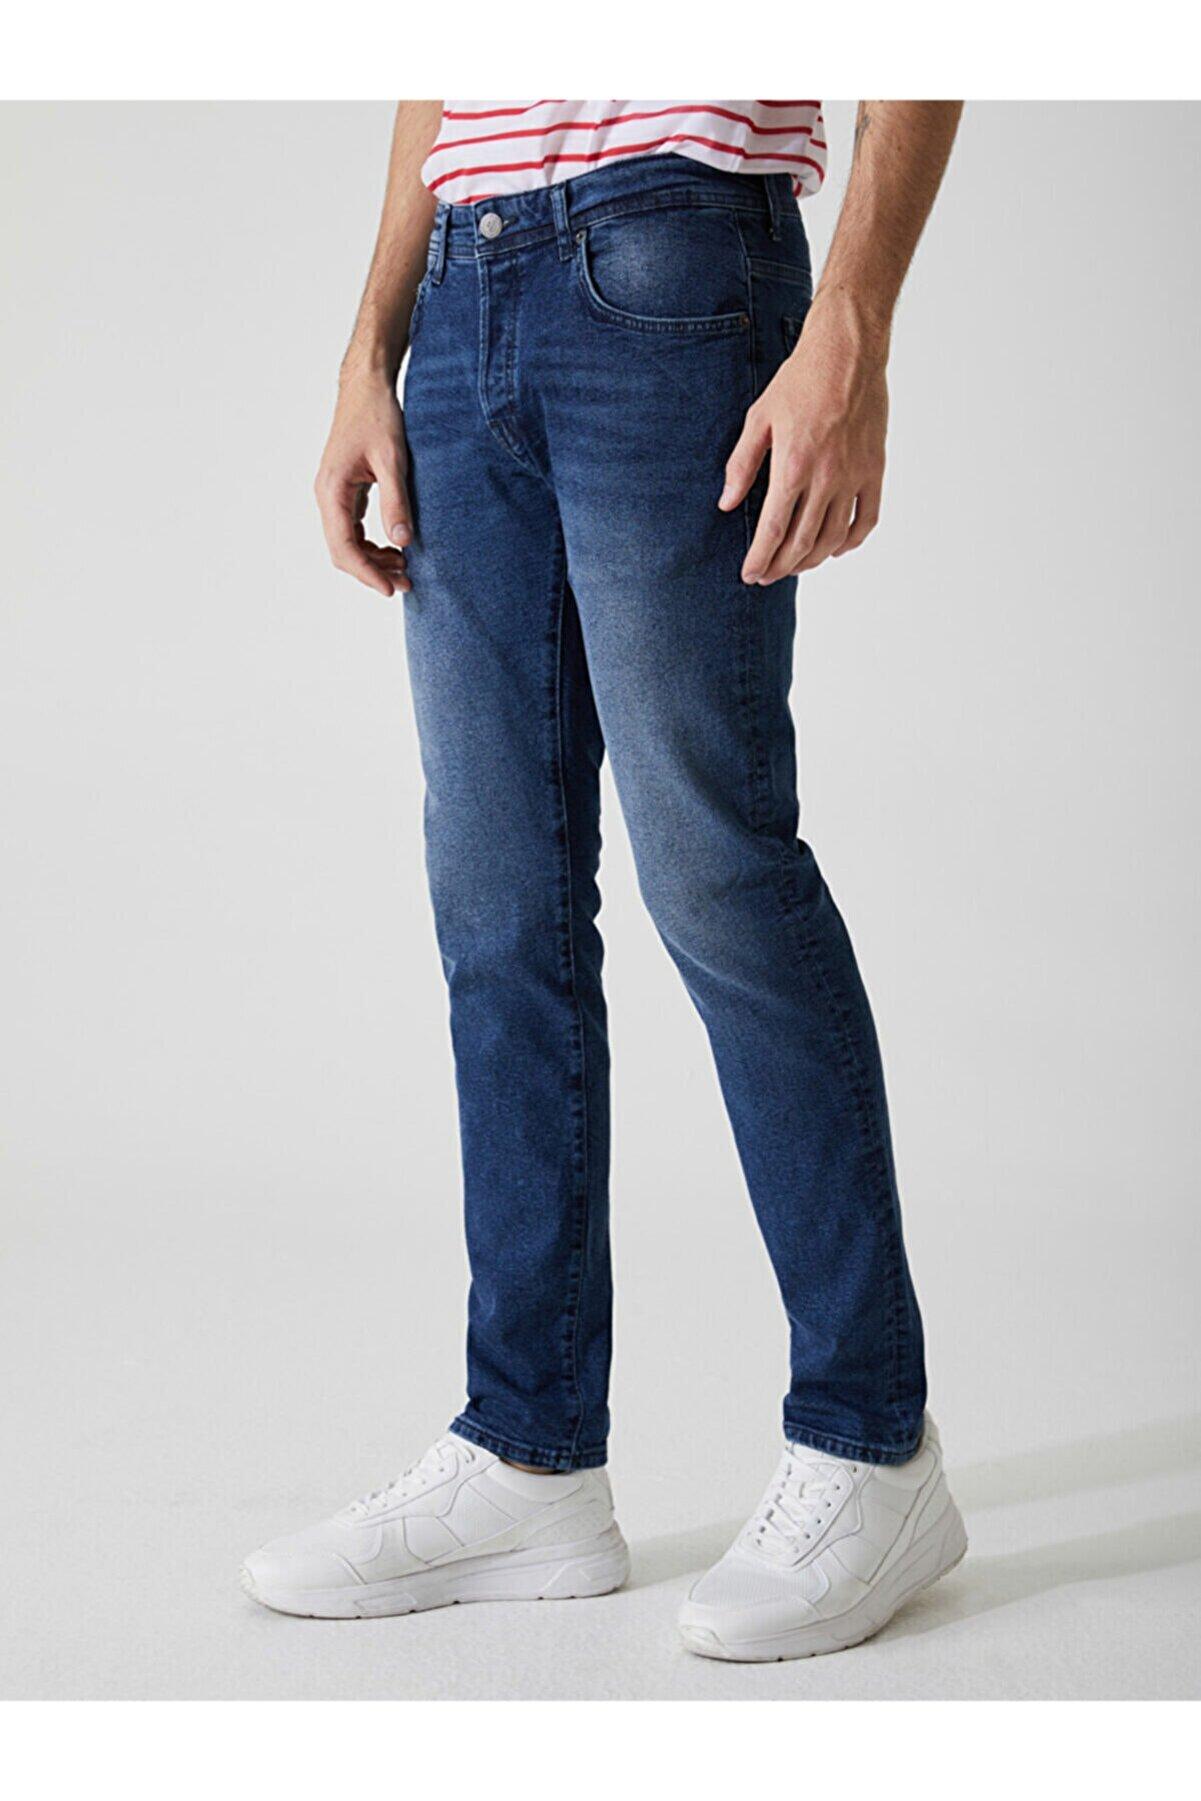 Ltb Hammond Dexter Wash Pantolon